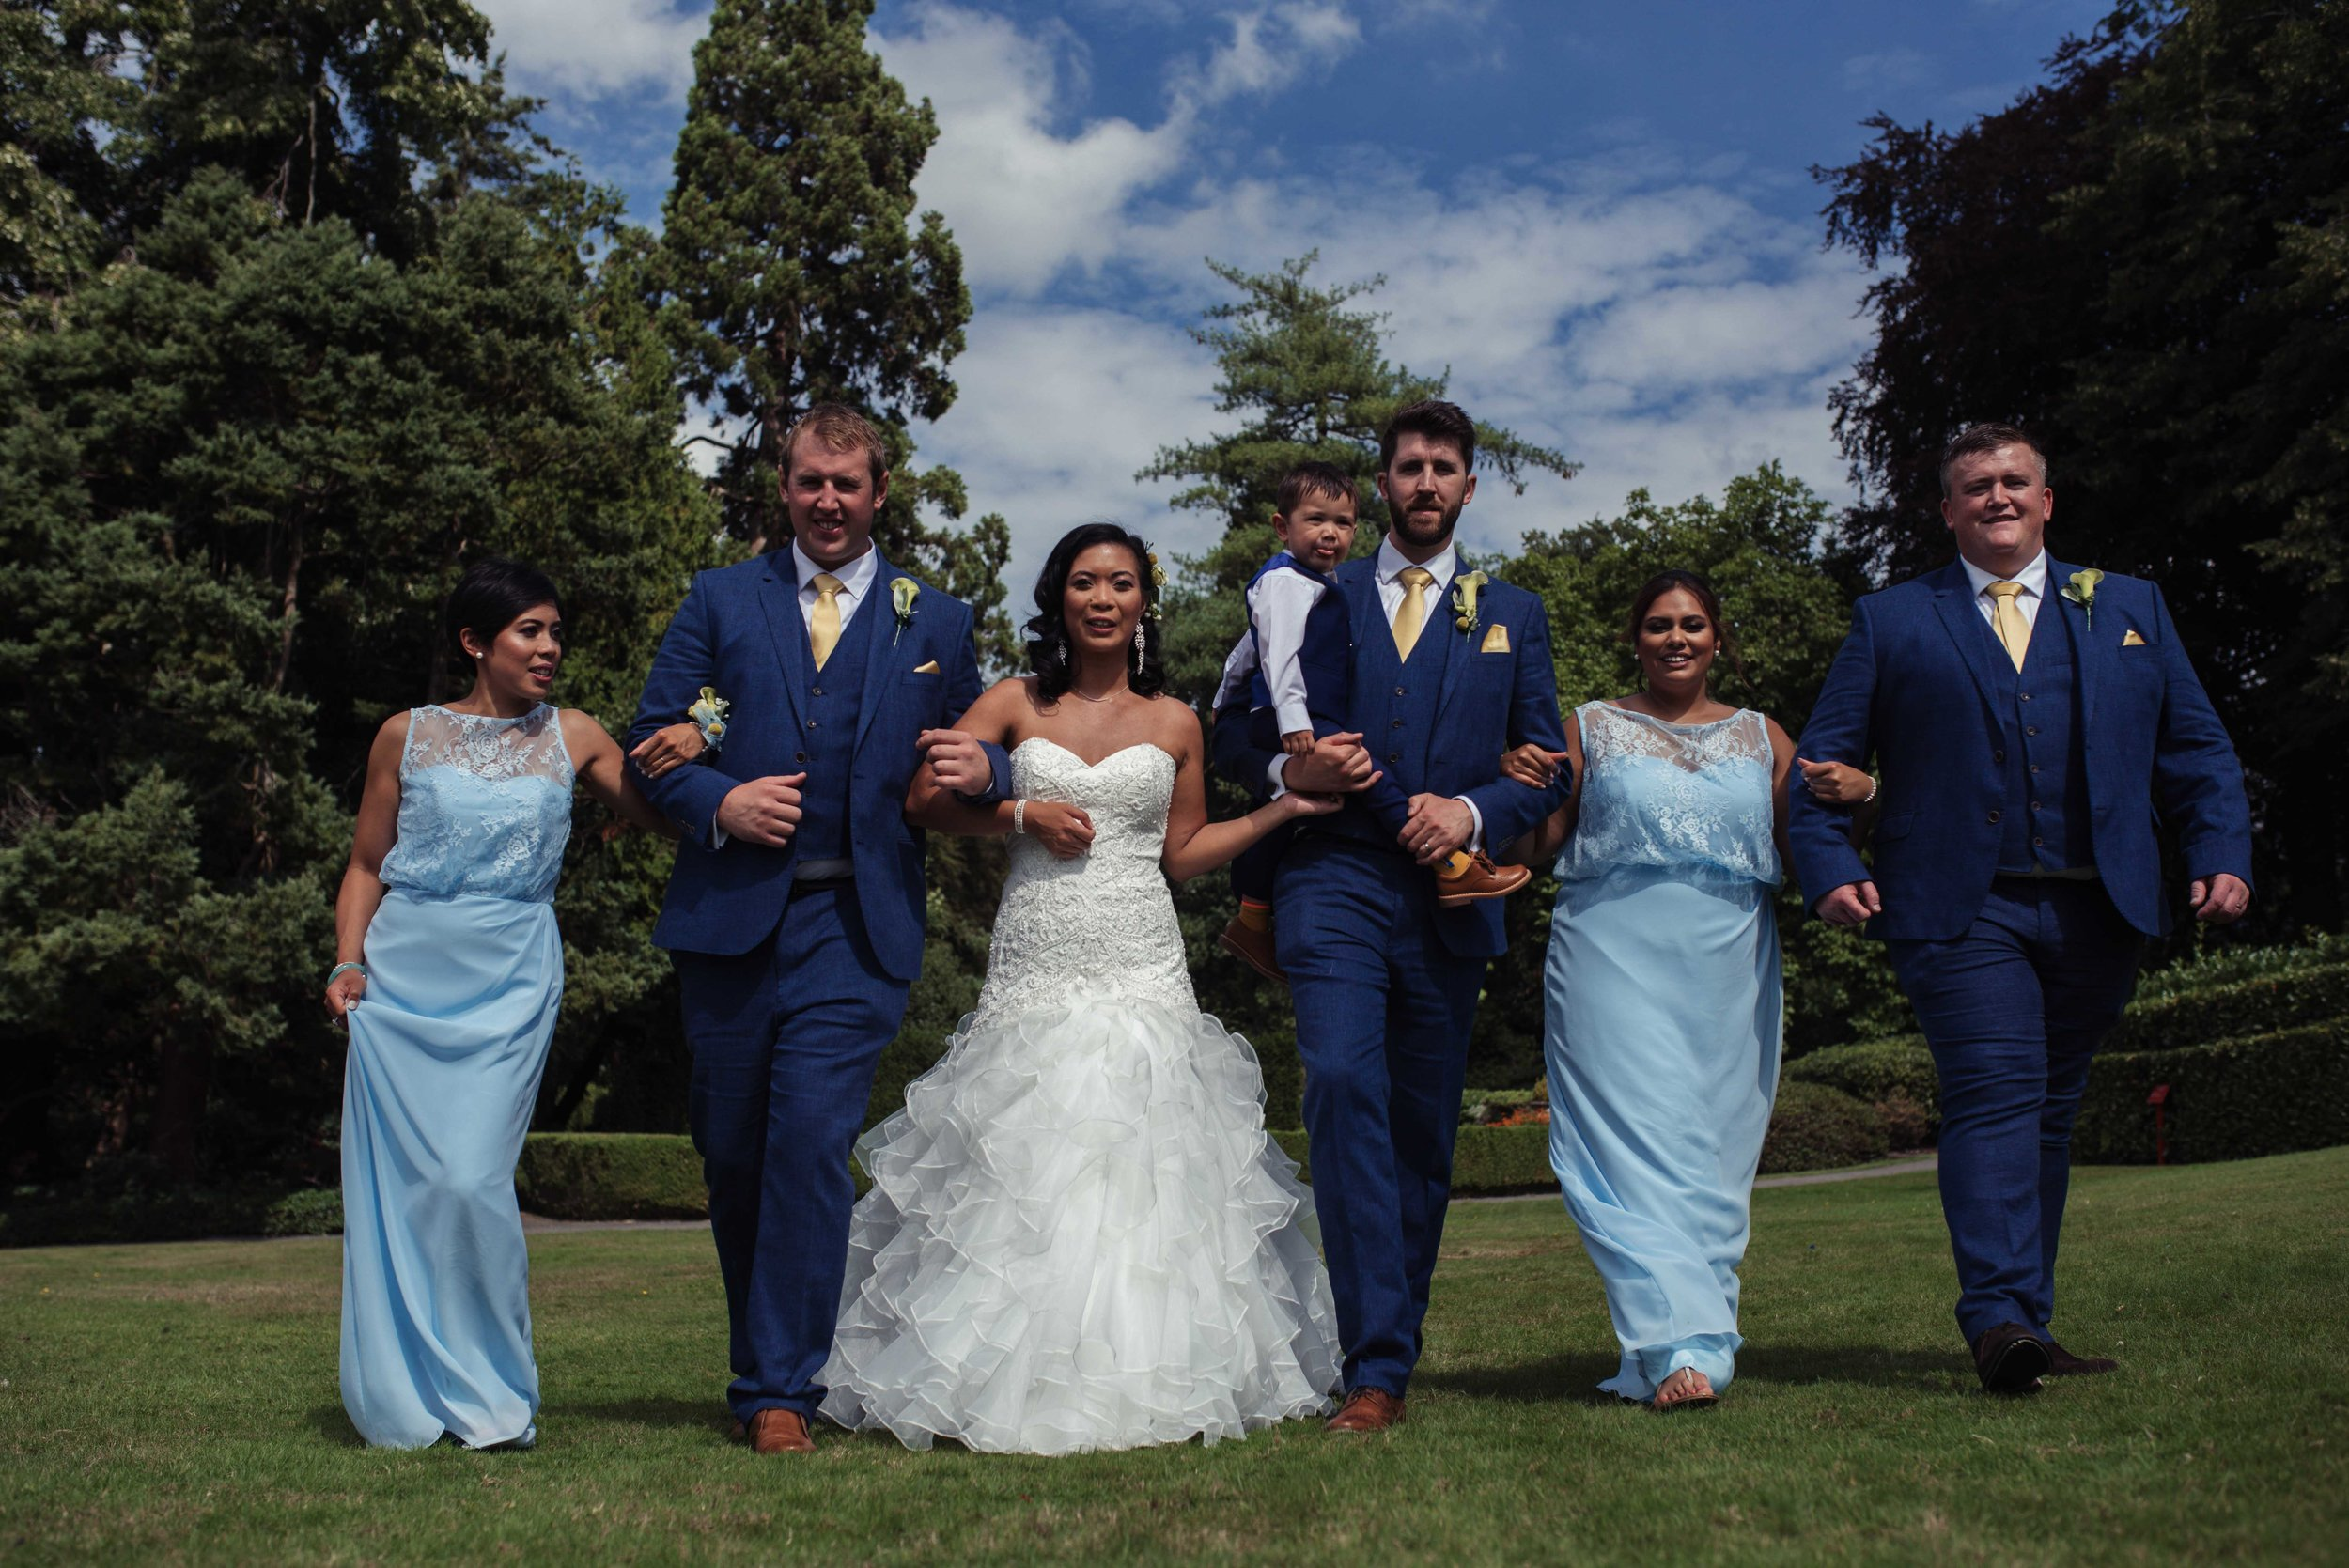 Belsfield Wedding Photography-50.jpg